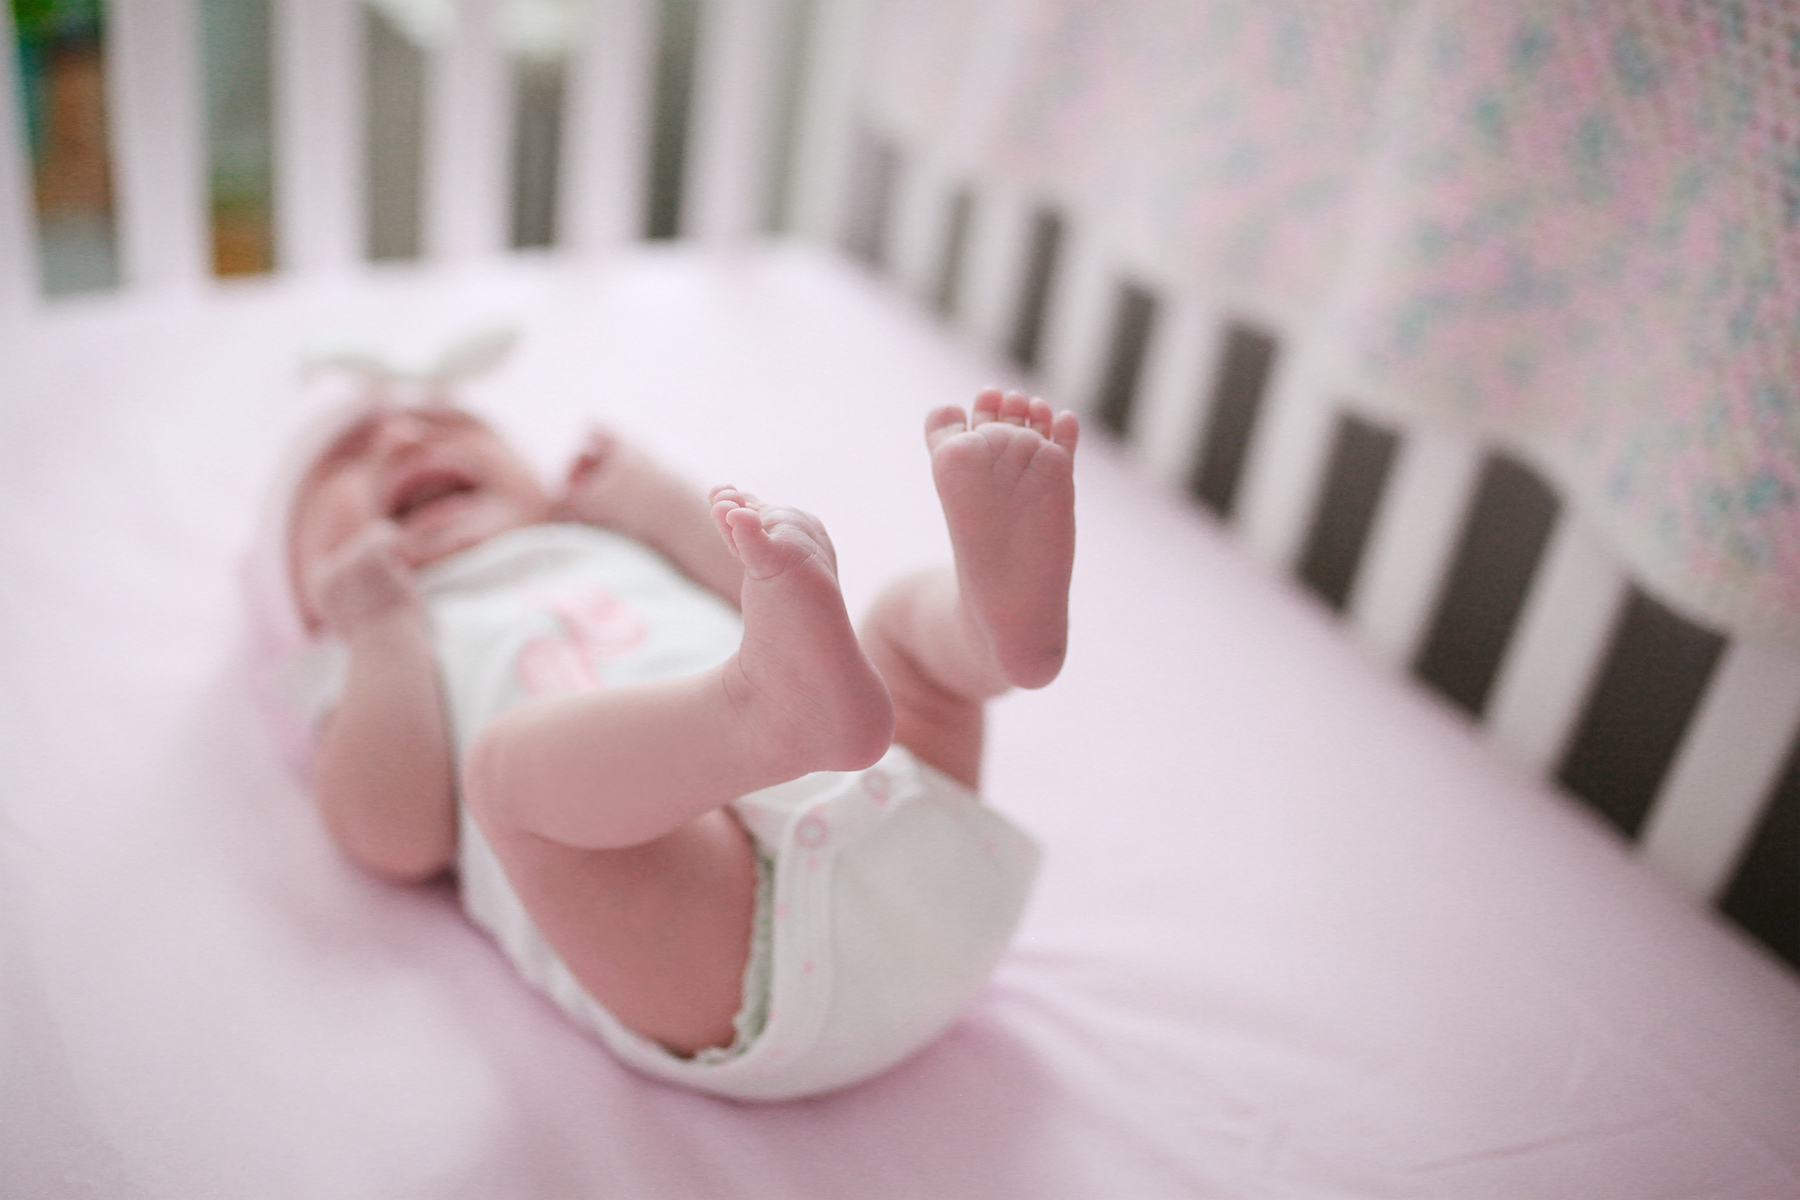 columbia-county-child-baby-photo-6